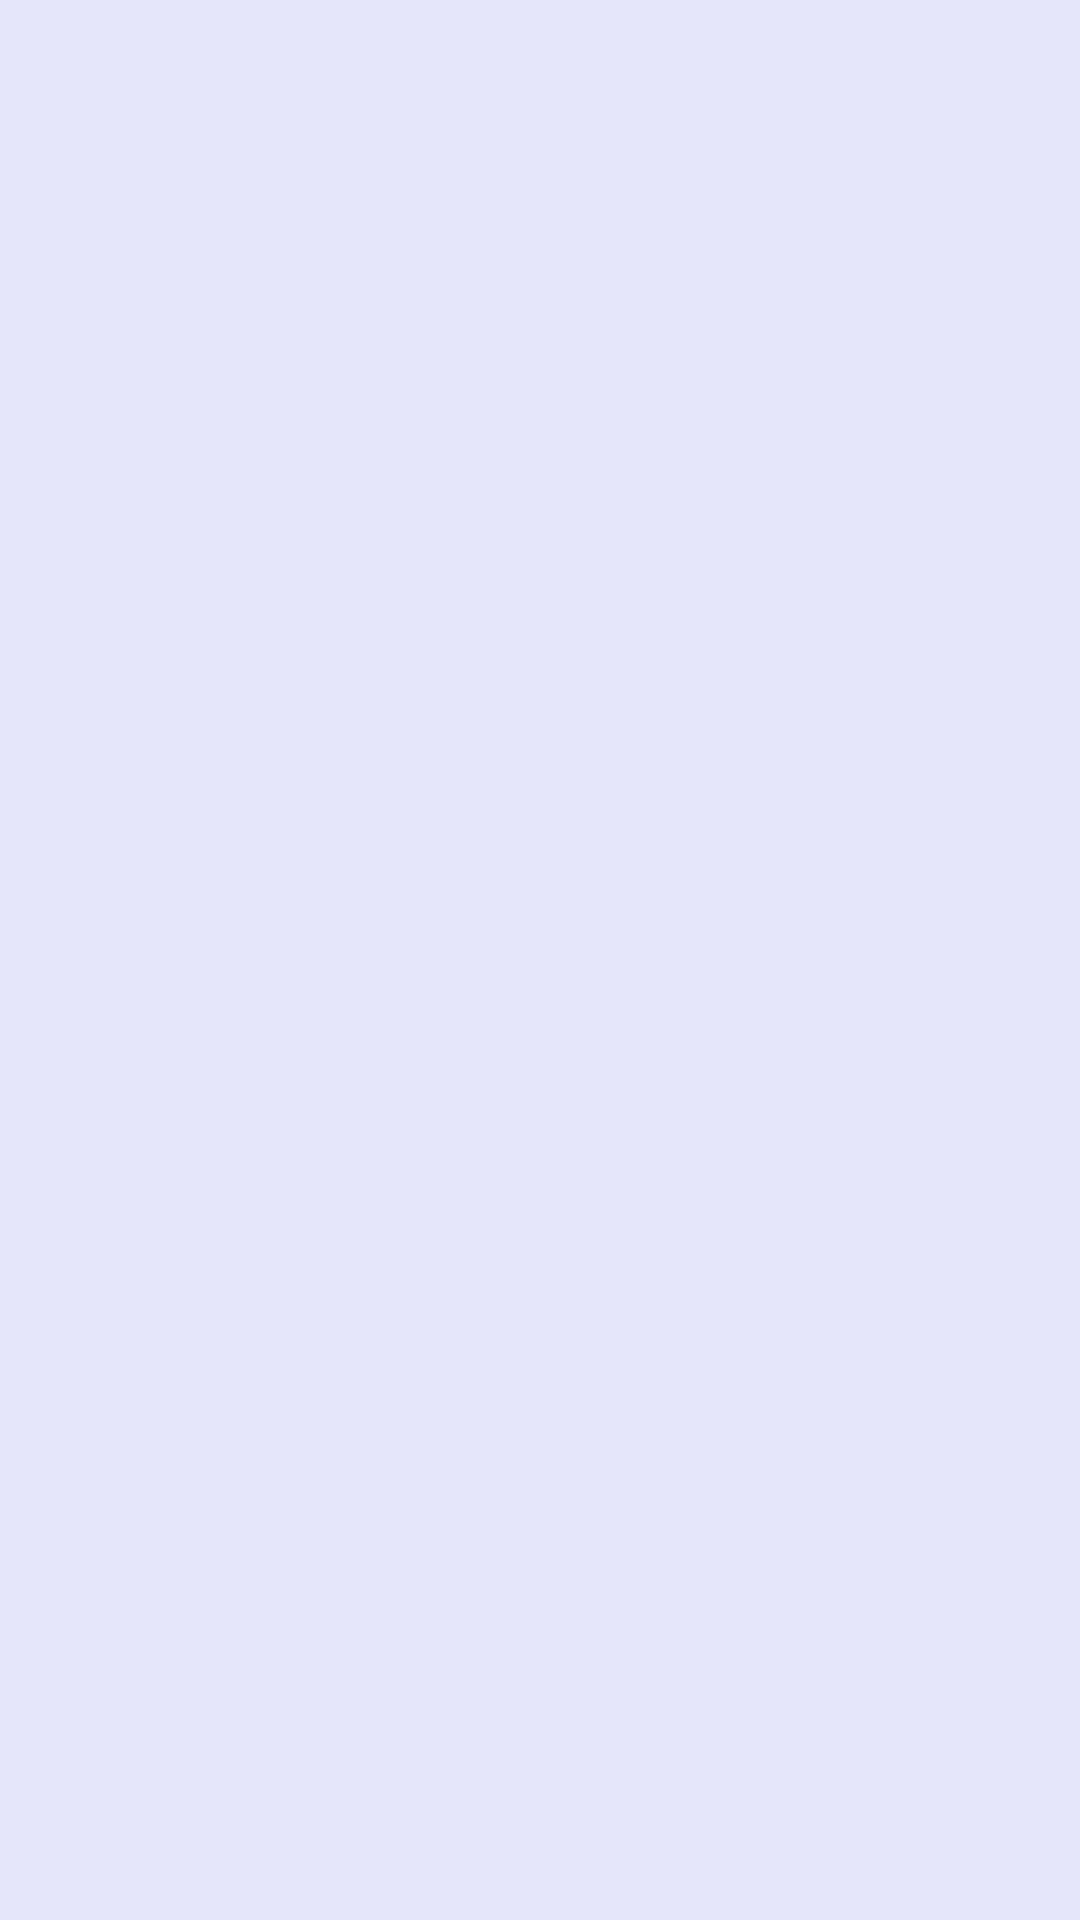 1080x1920 Lavender Web Solid Color Background